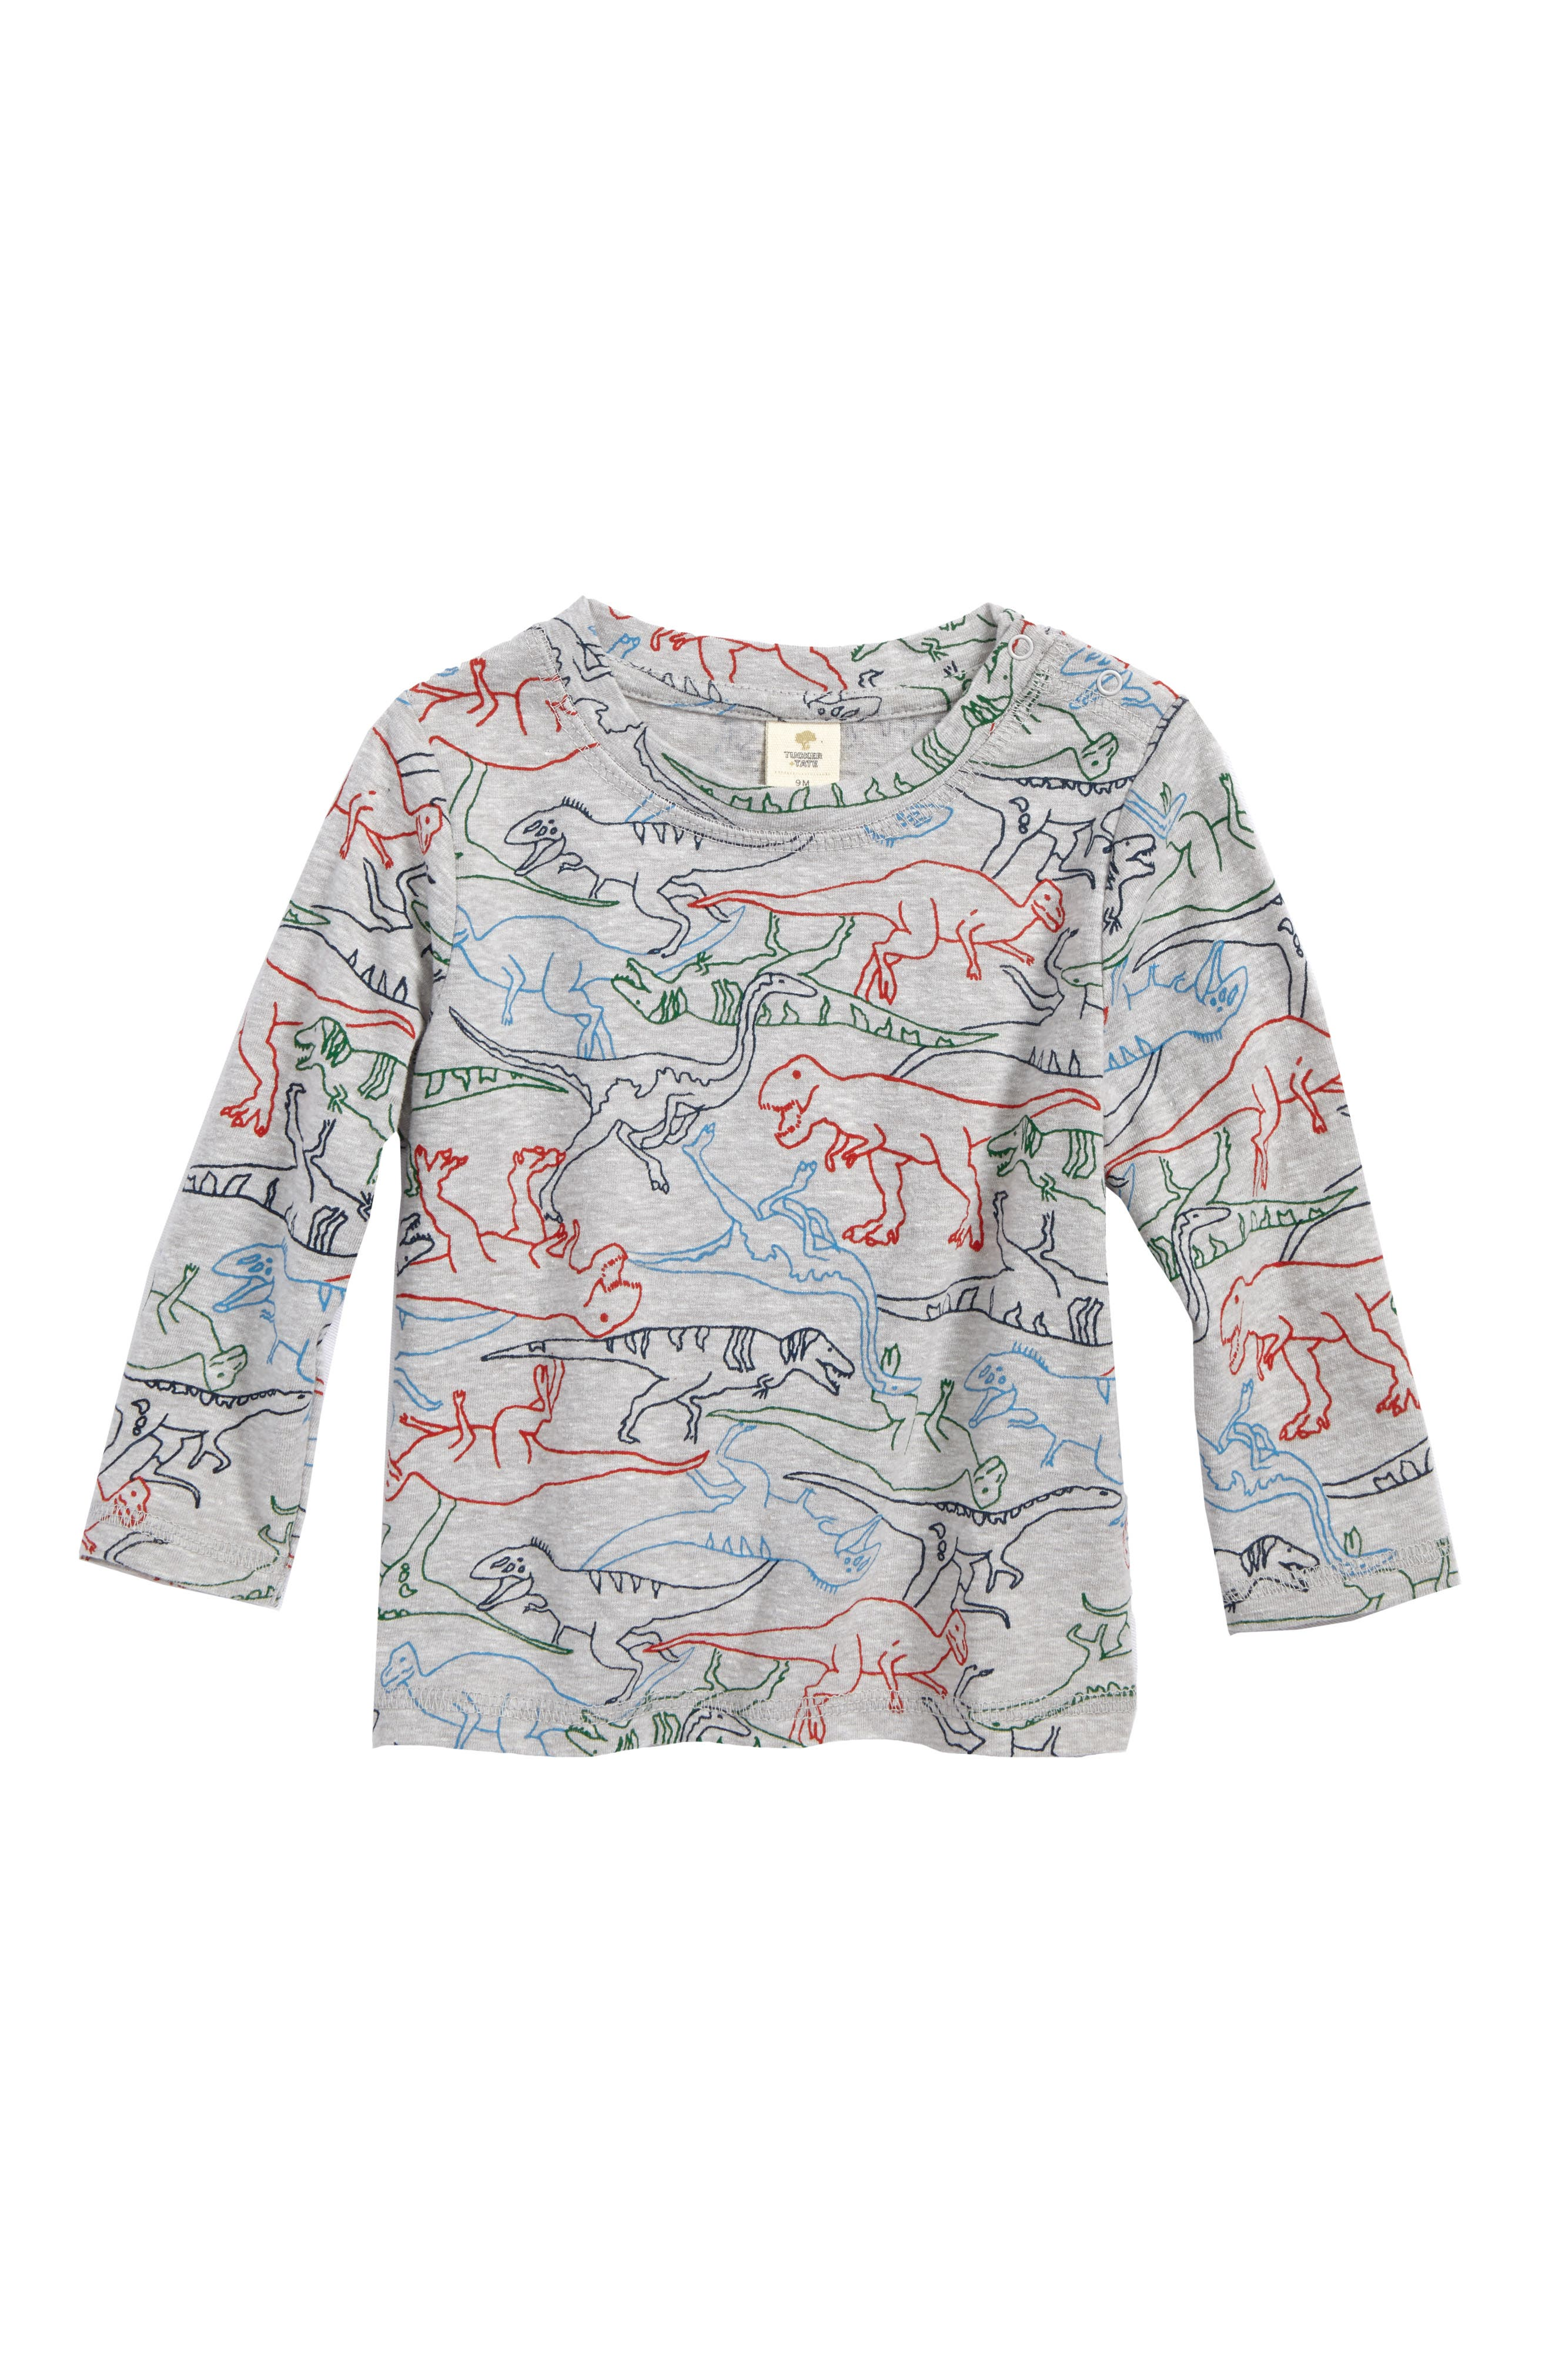 Print T-Shirt,                         Main,                         color, Grey Ash Heather Multi Dino